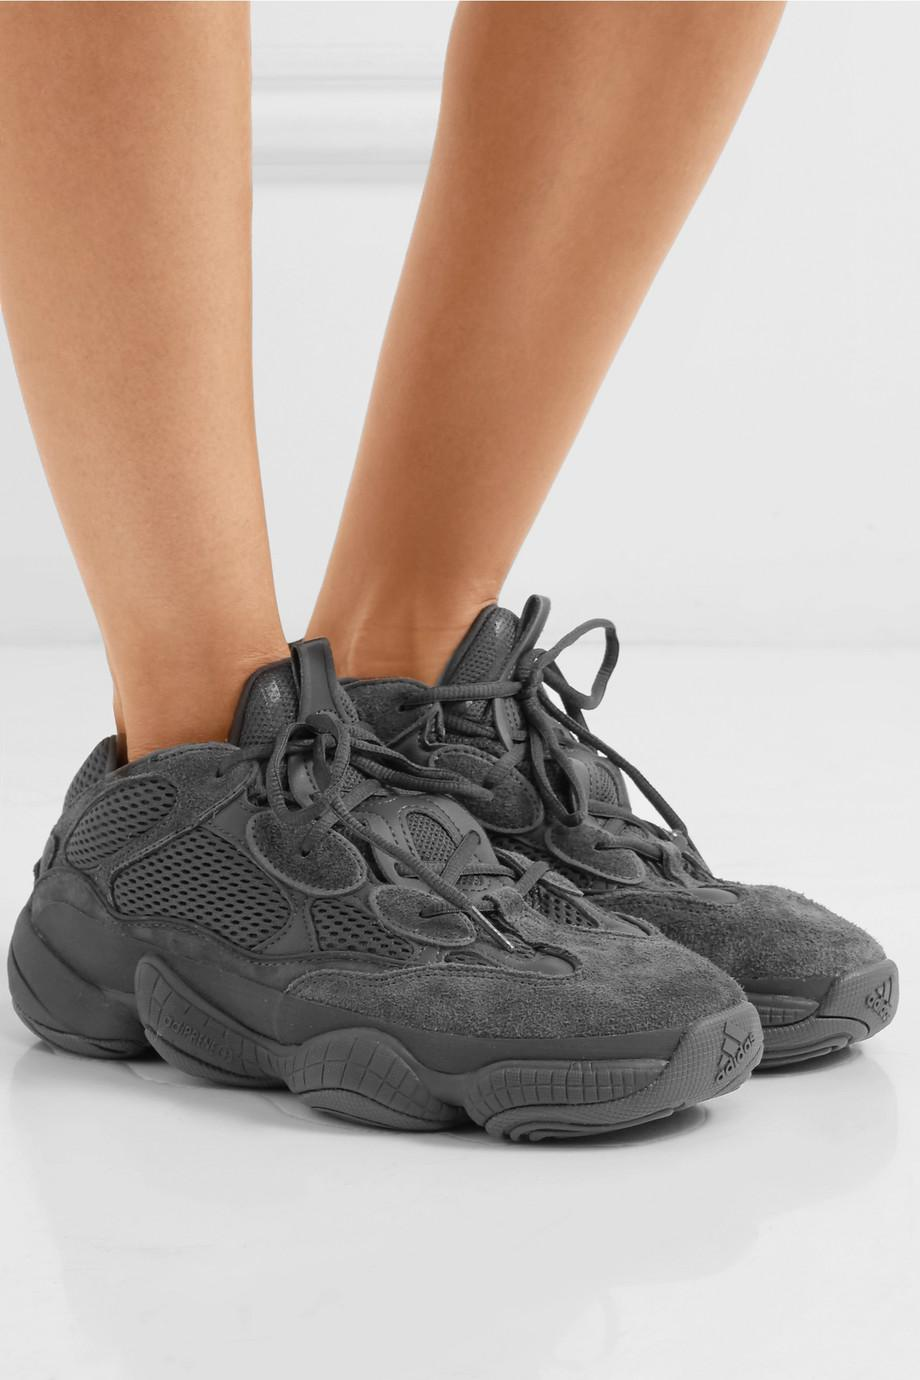 ea3cc8d6c3ea adidas Originals Kanye West Yeezy 500 Desert Rat Suede And Mesh ...